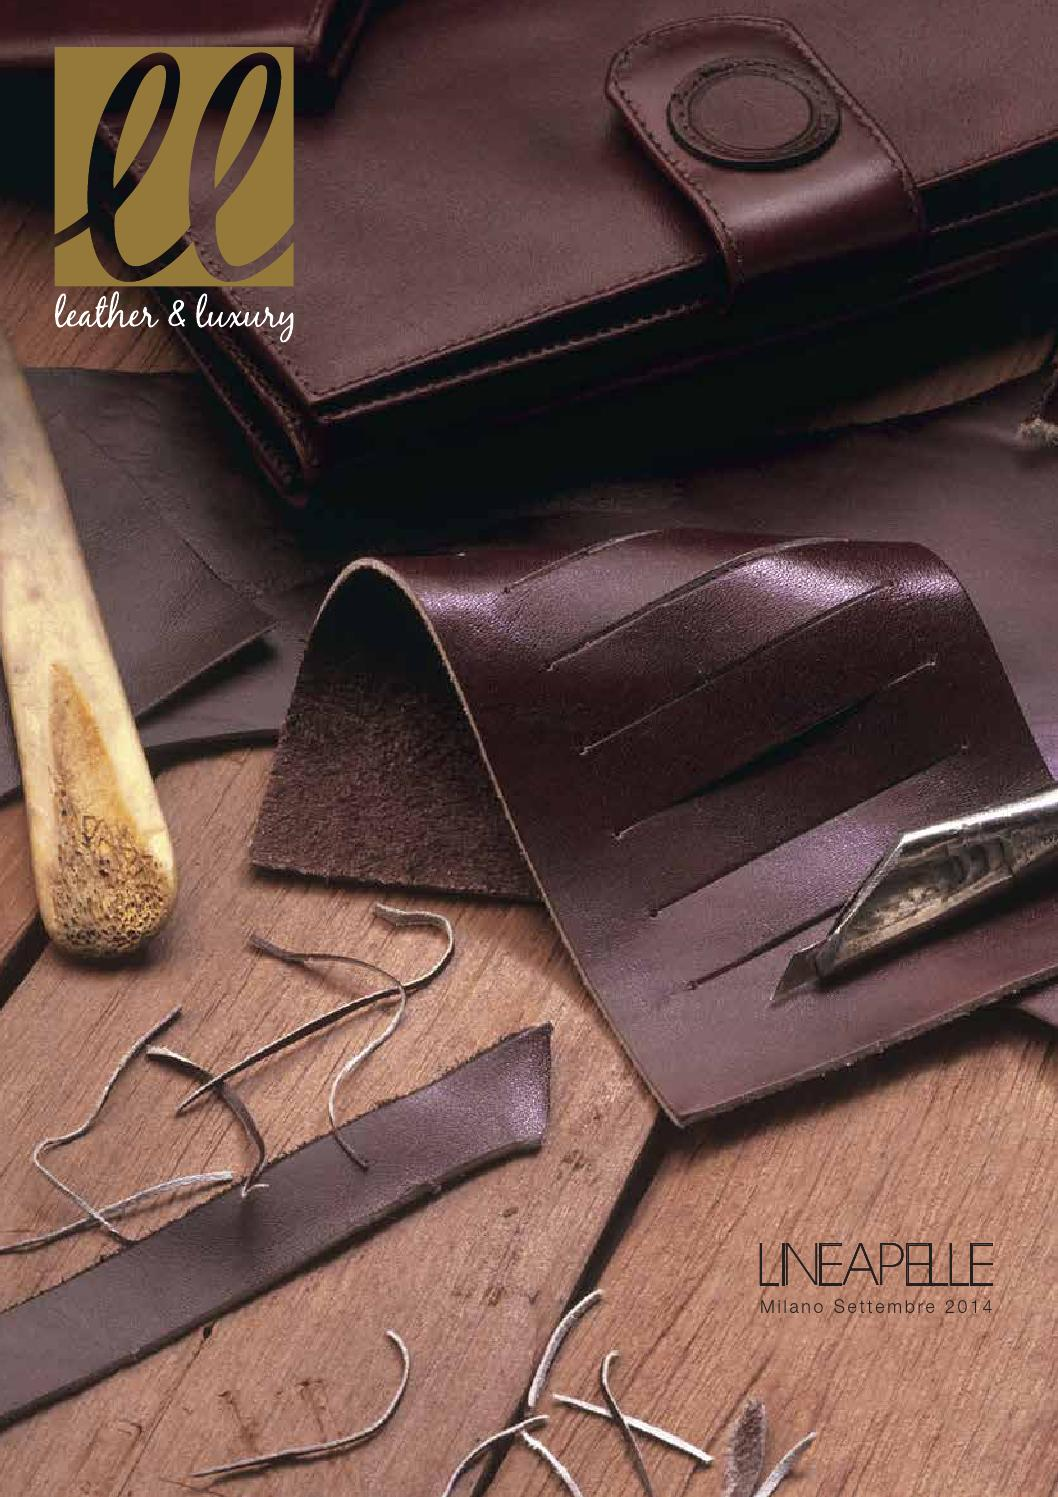 b21c7e47a0 Leather & Luxury 3 by MGA Comunicazione - issuu